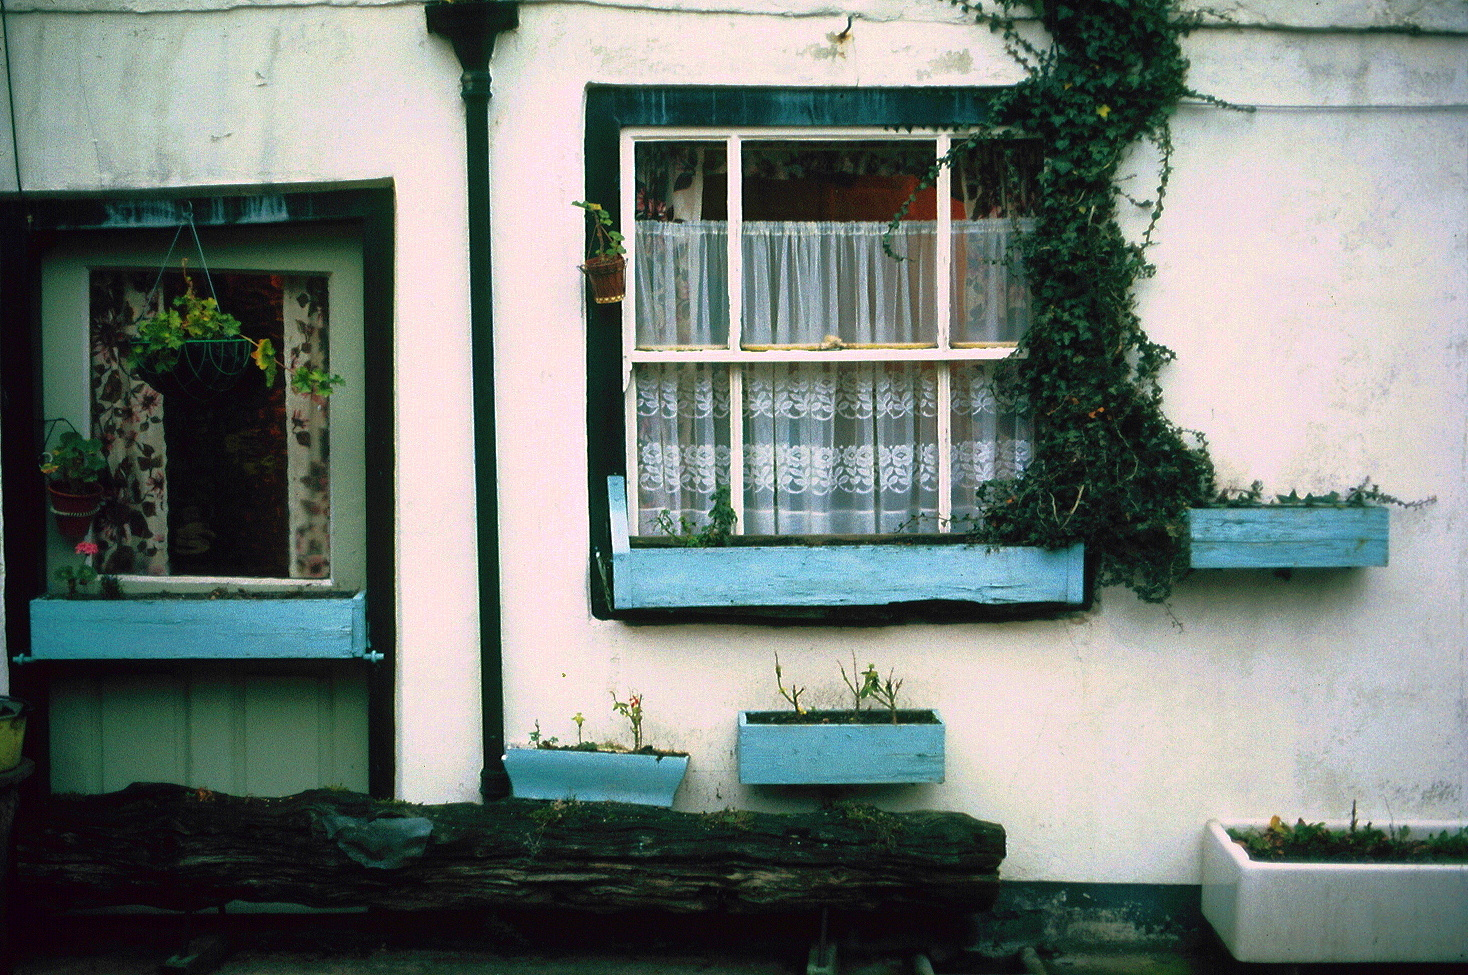 Ramsey, Huntingdonshire